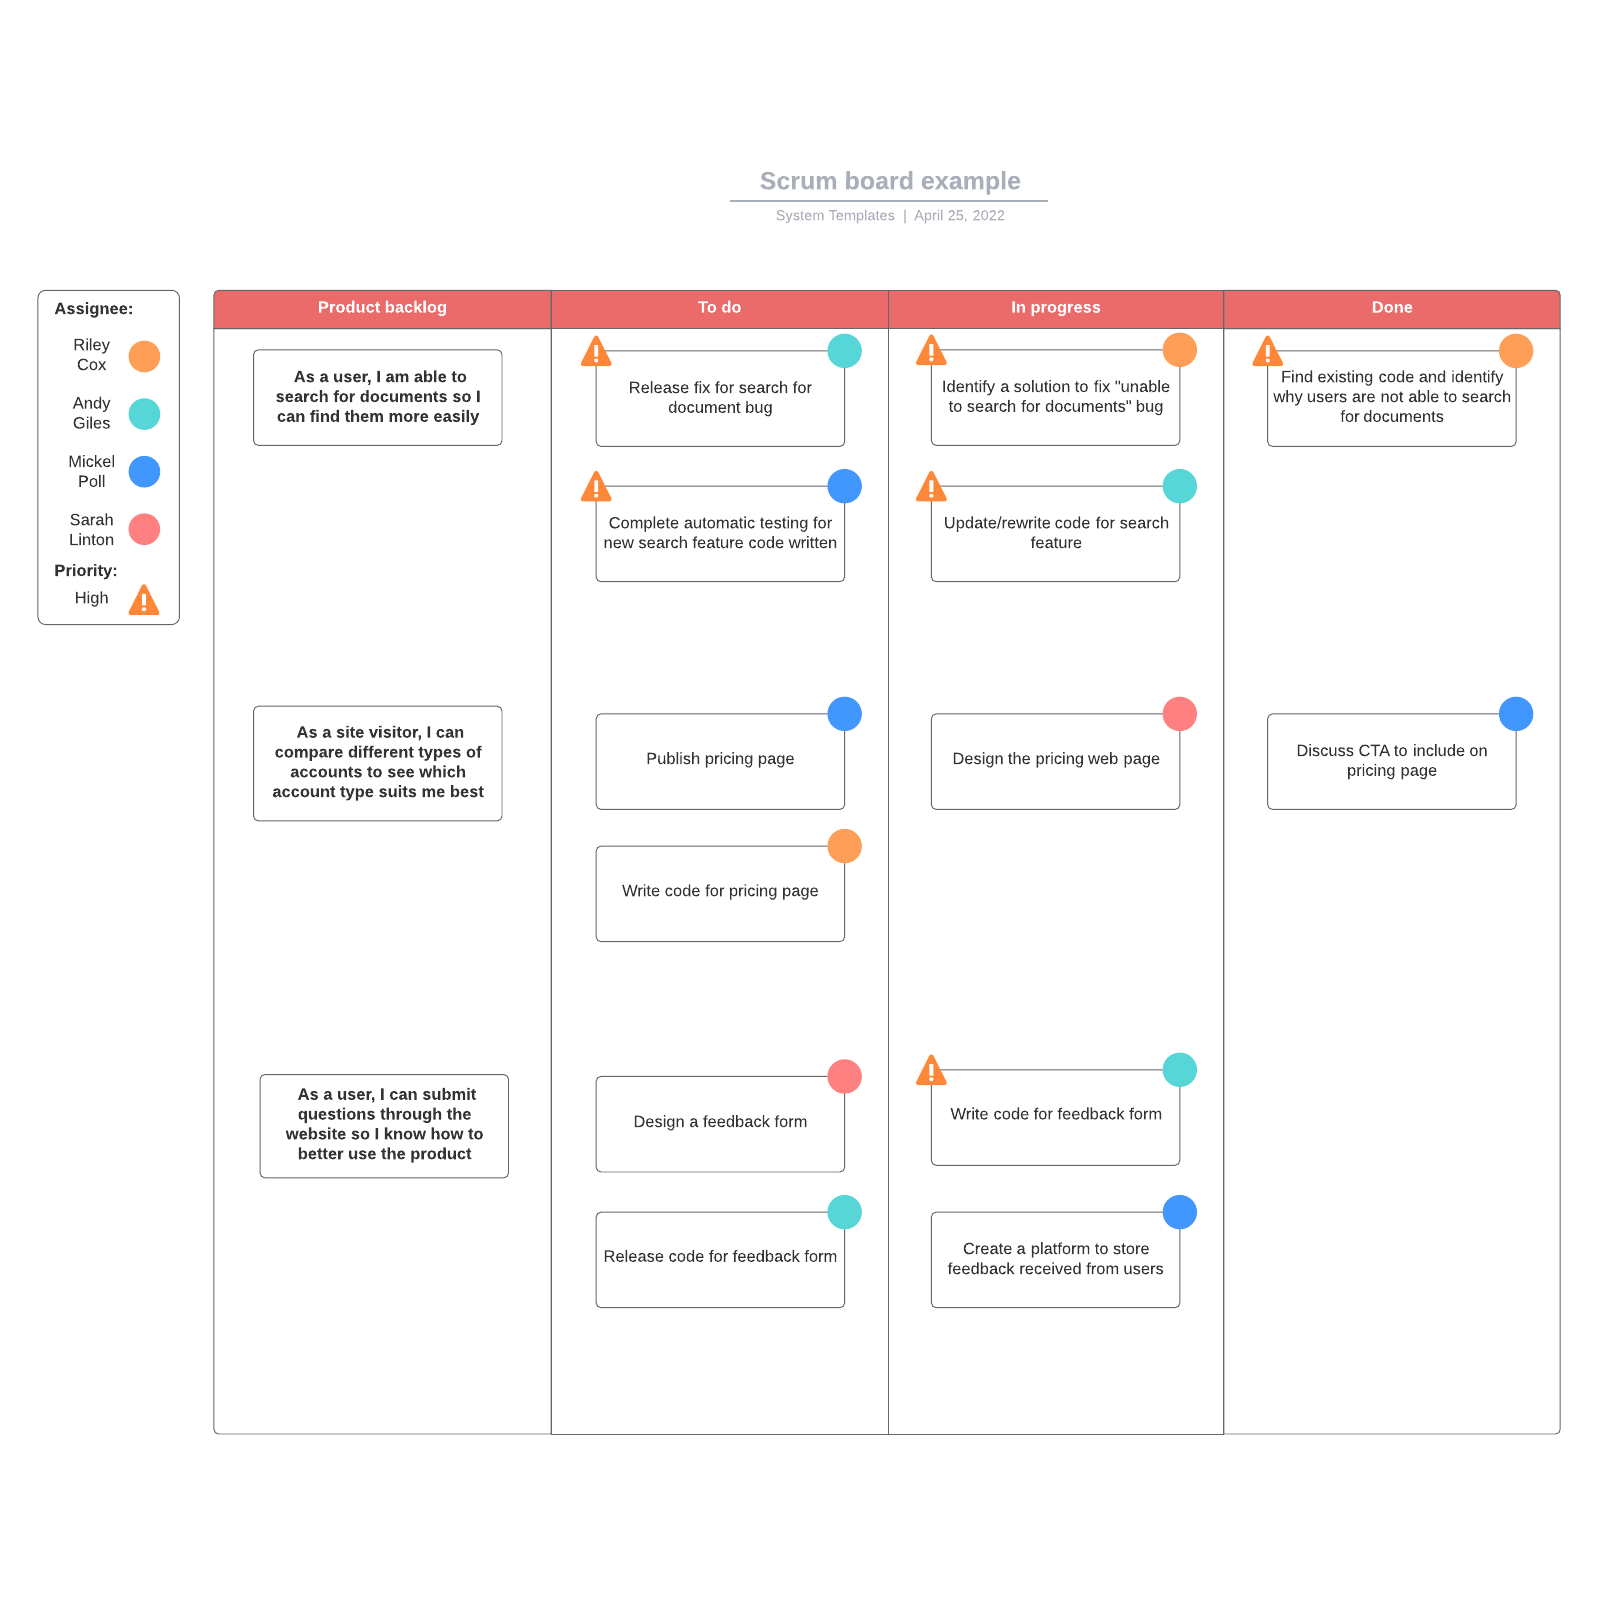 Scrum board example